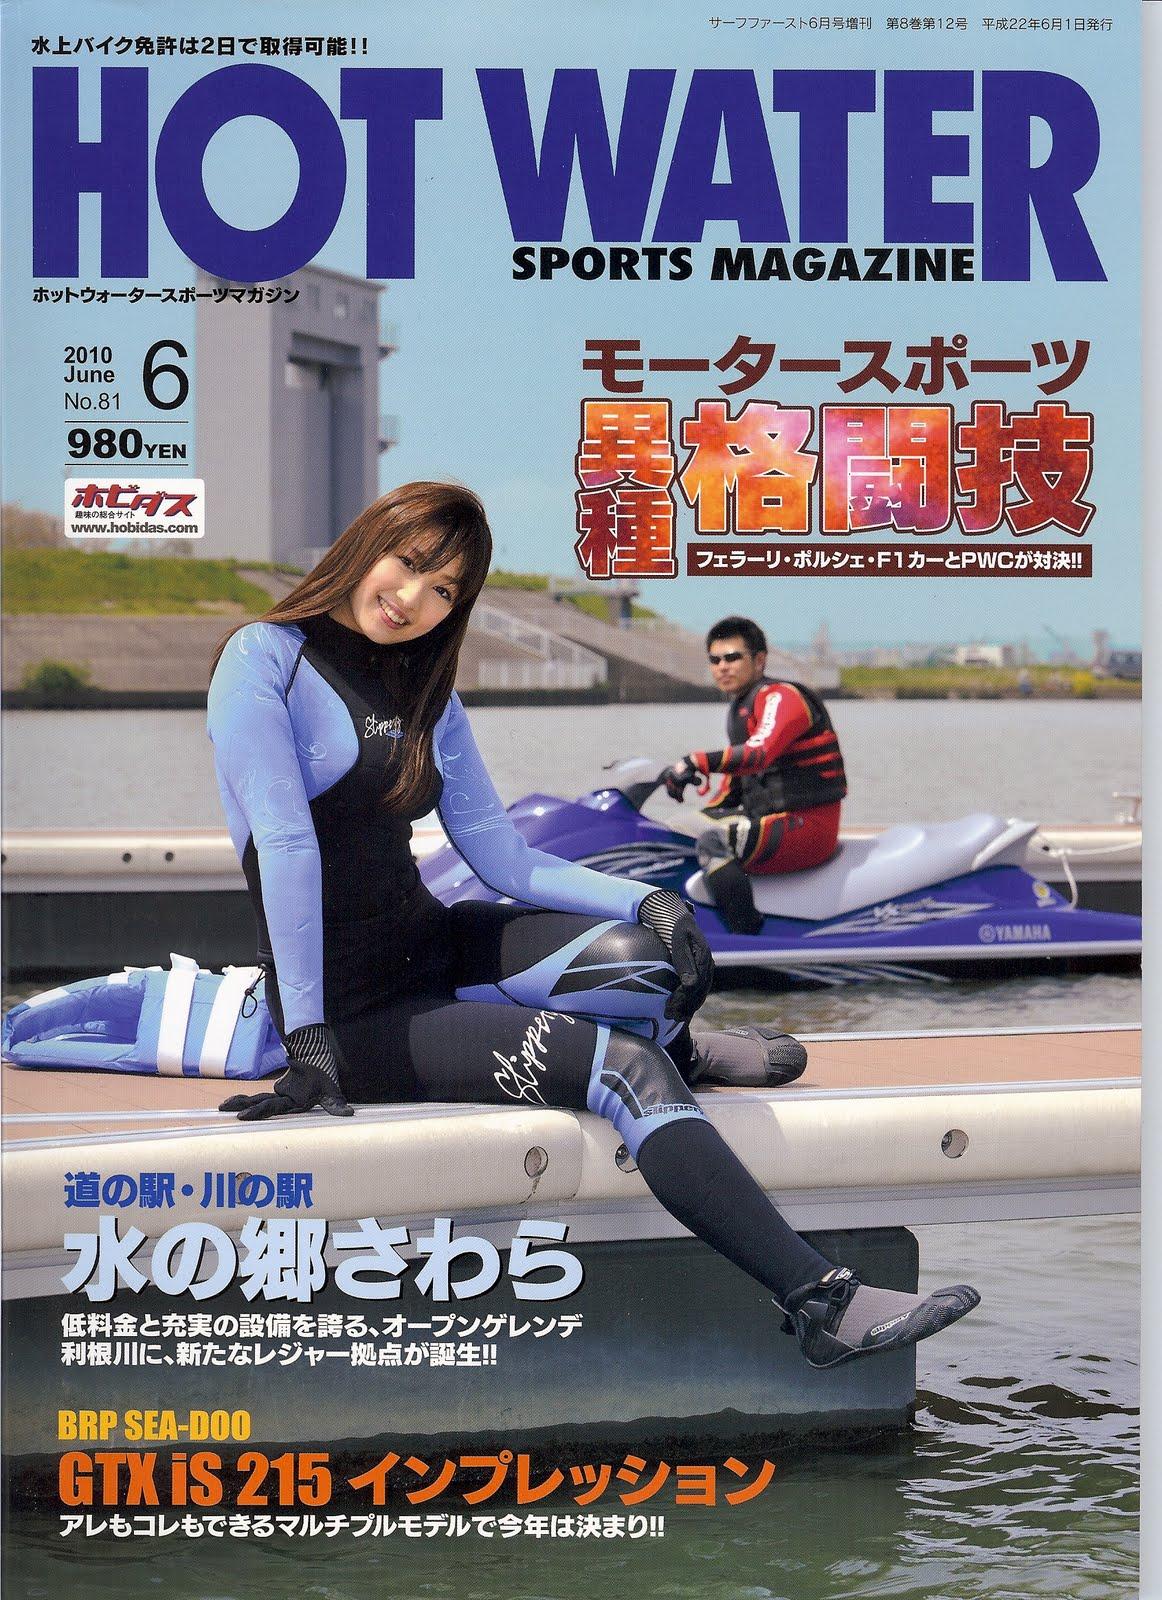 Jet Ski Doctor's Blog / Service, Repair, Parts: Japanese Jet ski